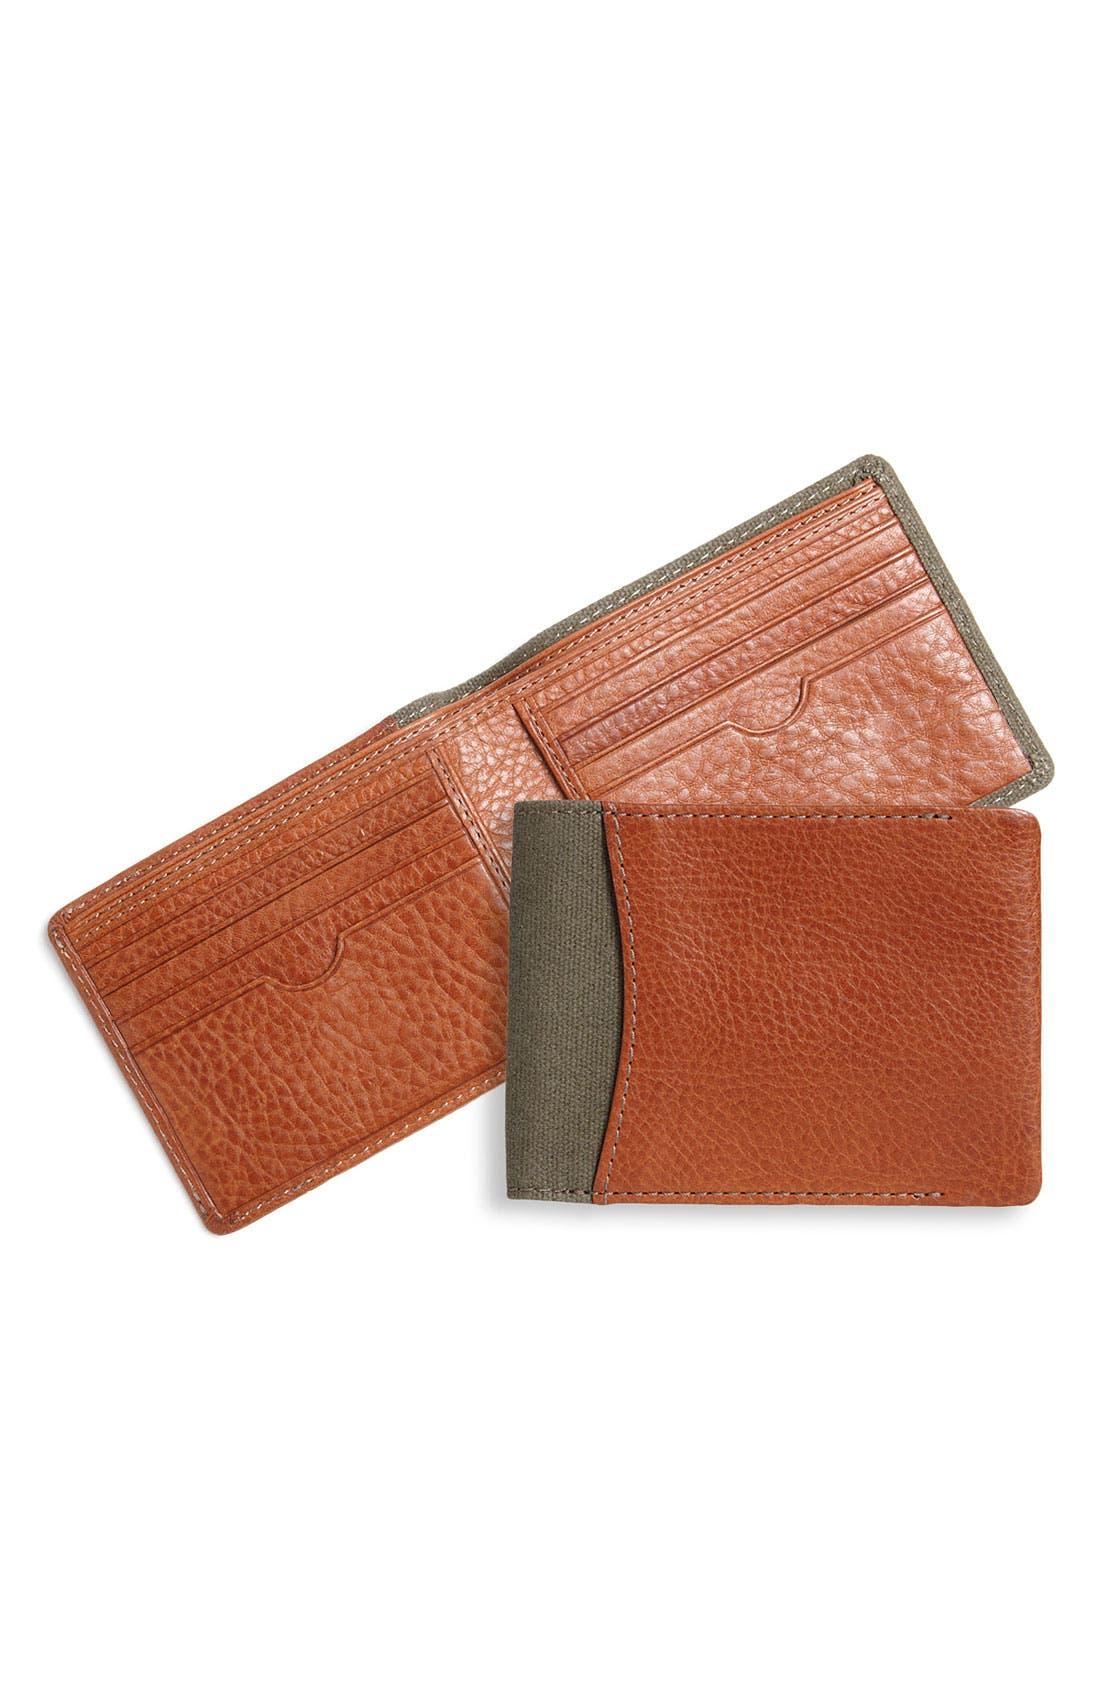 Main Image - Bosca Deluxe Executive Wallet